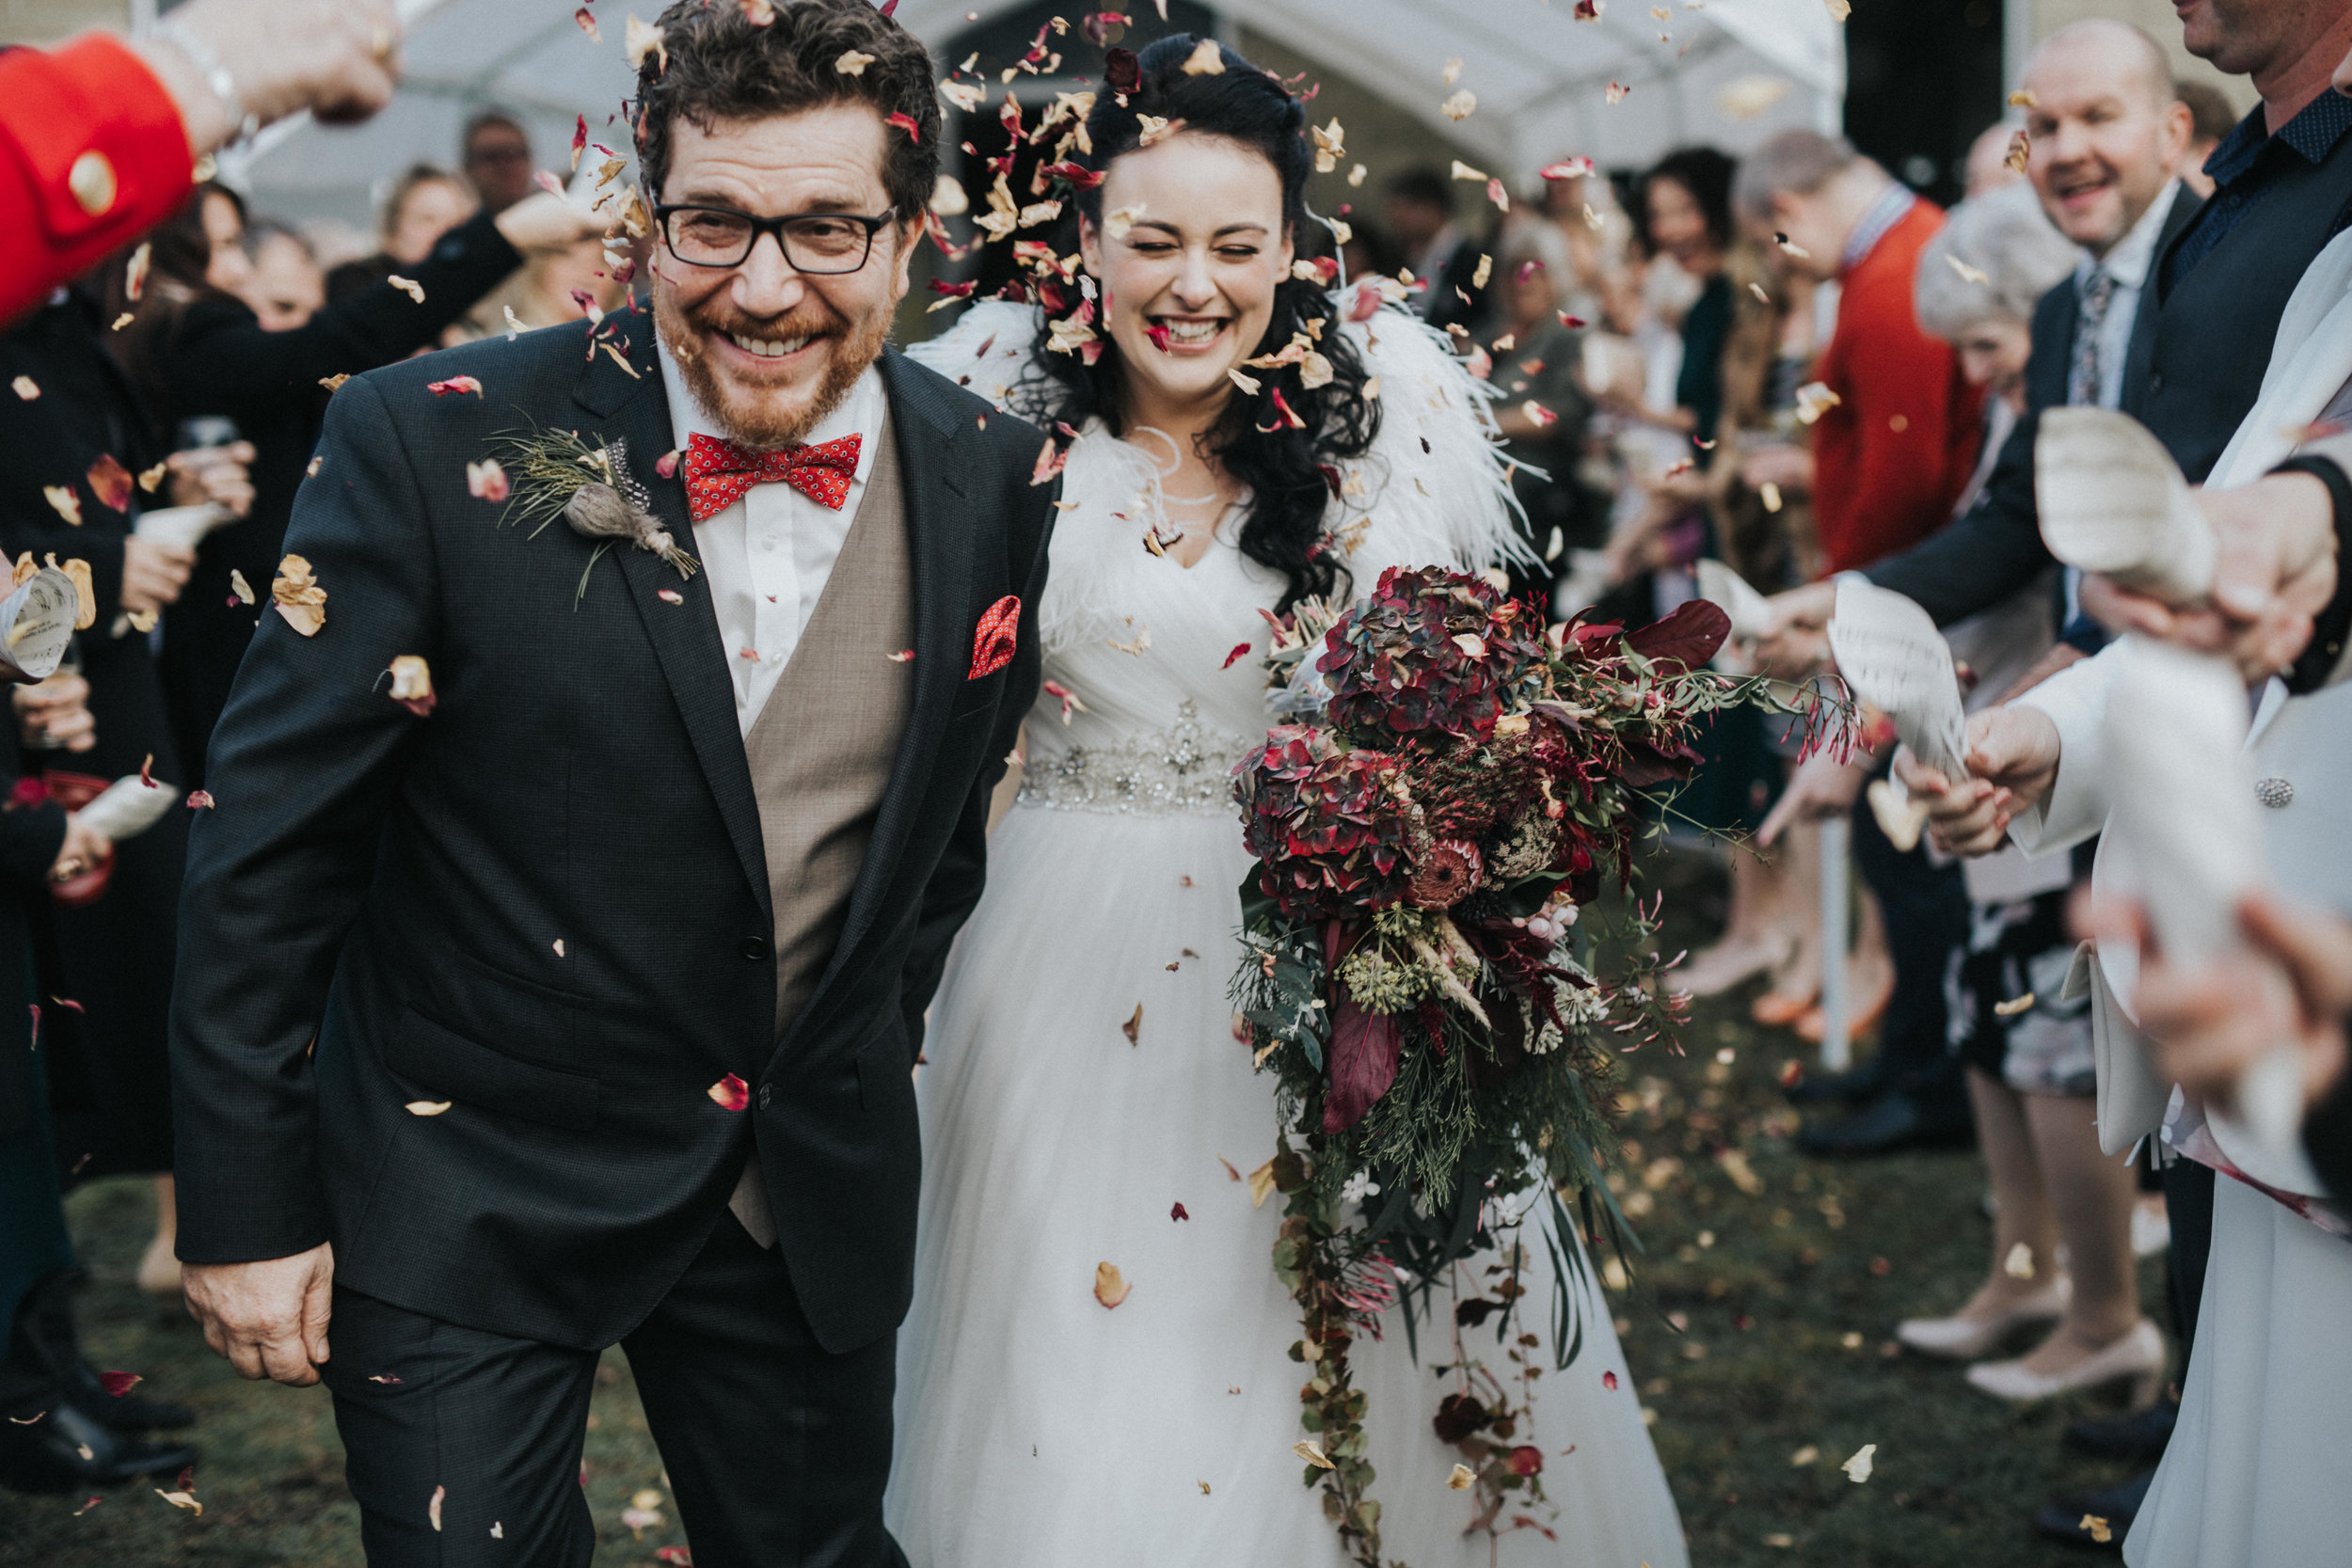 Cassie-Sullivan-Spencer-Tasmanian-Wedding-330.jpg